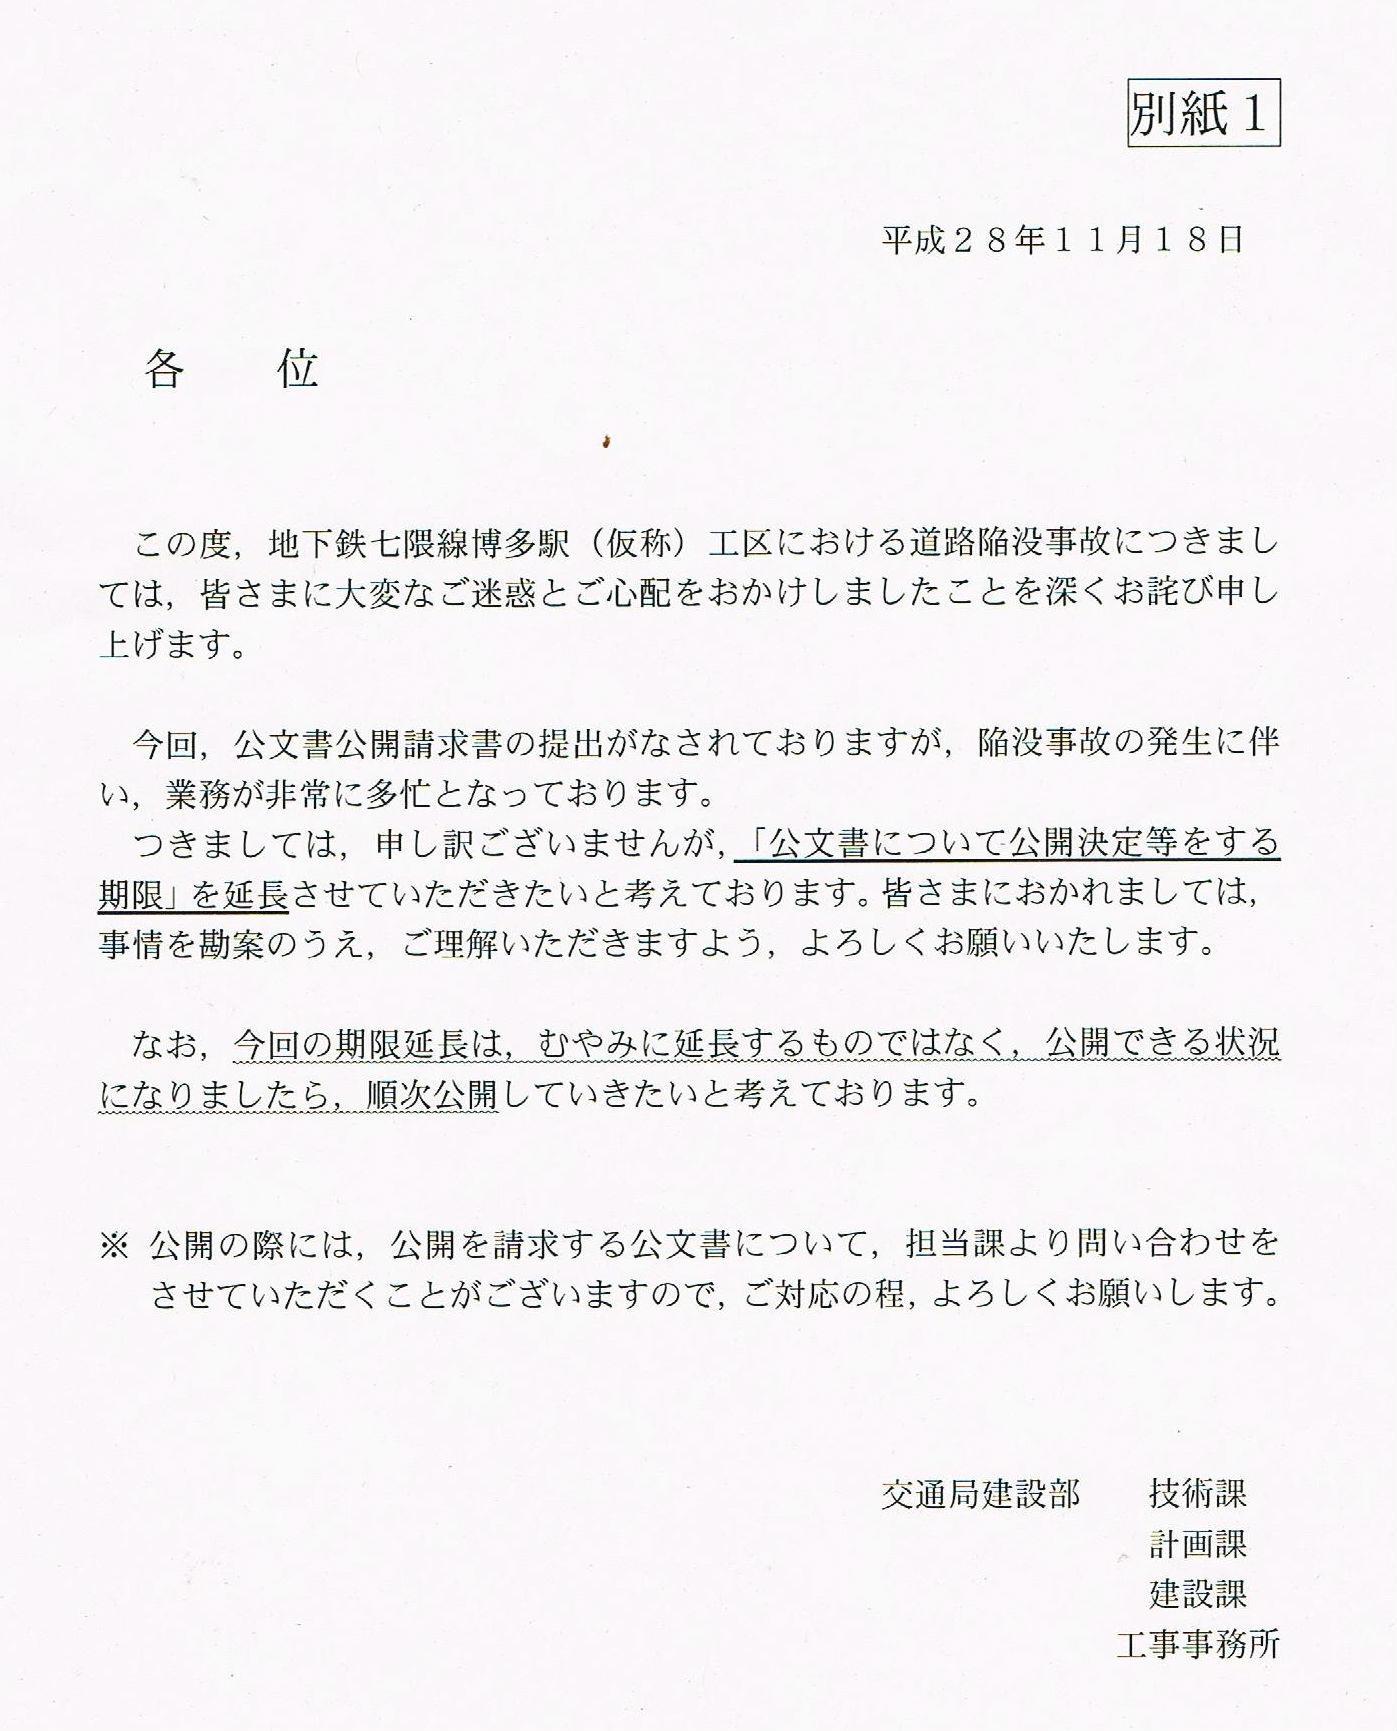 http://hunter-investigate.jp/news/194fca4604d33bf8fab2e728c27d4adbeeb5acc2.jpg